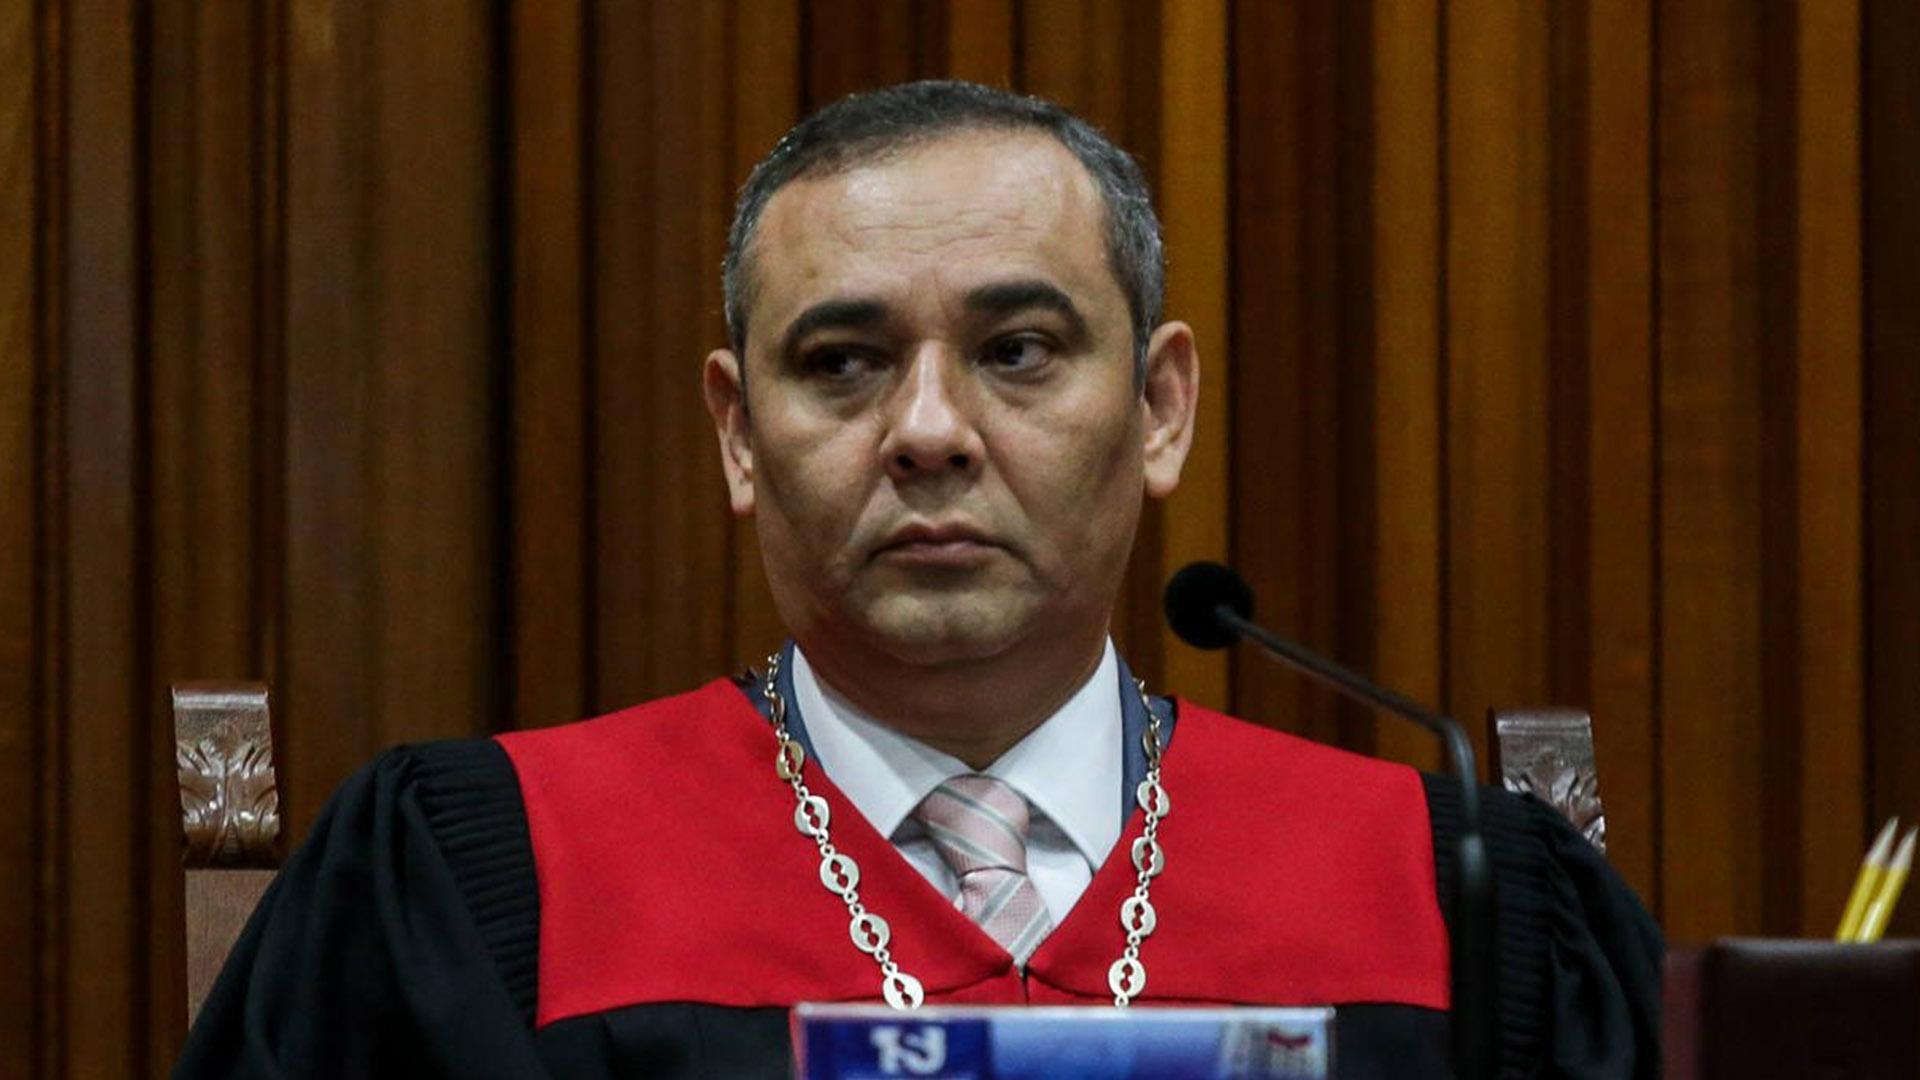 [Comunicado] Así le respondió Maikel Moreno a EEUU por ofrecer recompensa por su captura